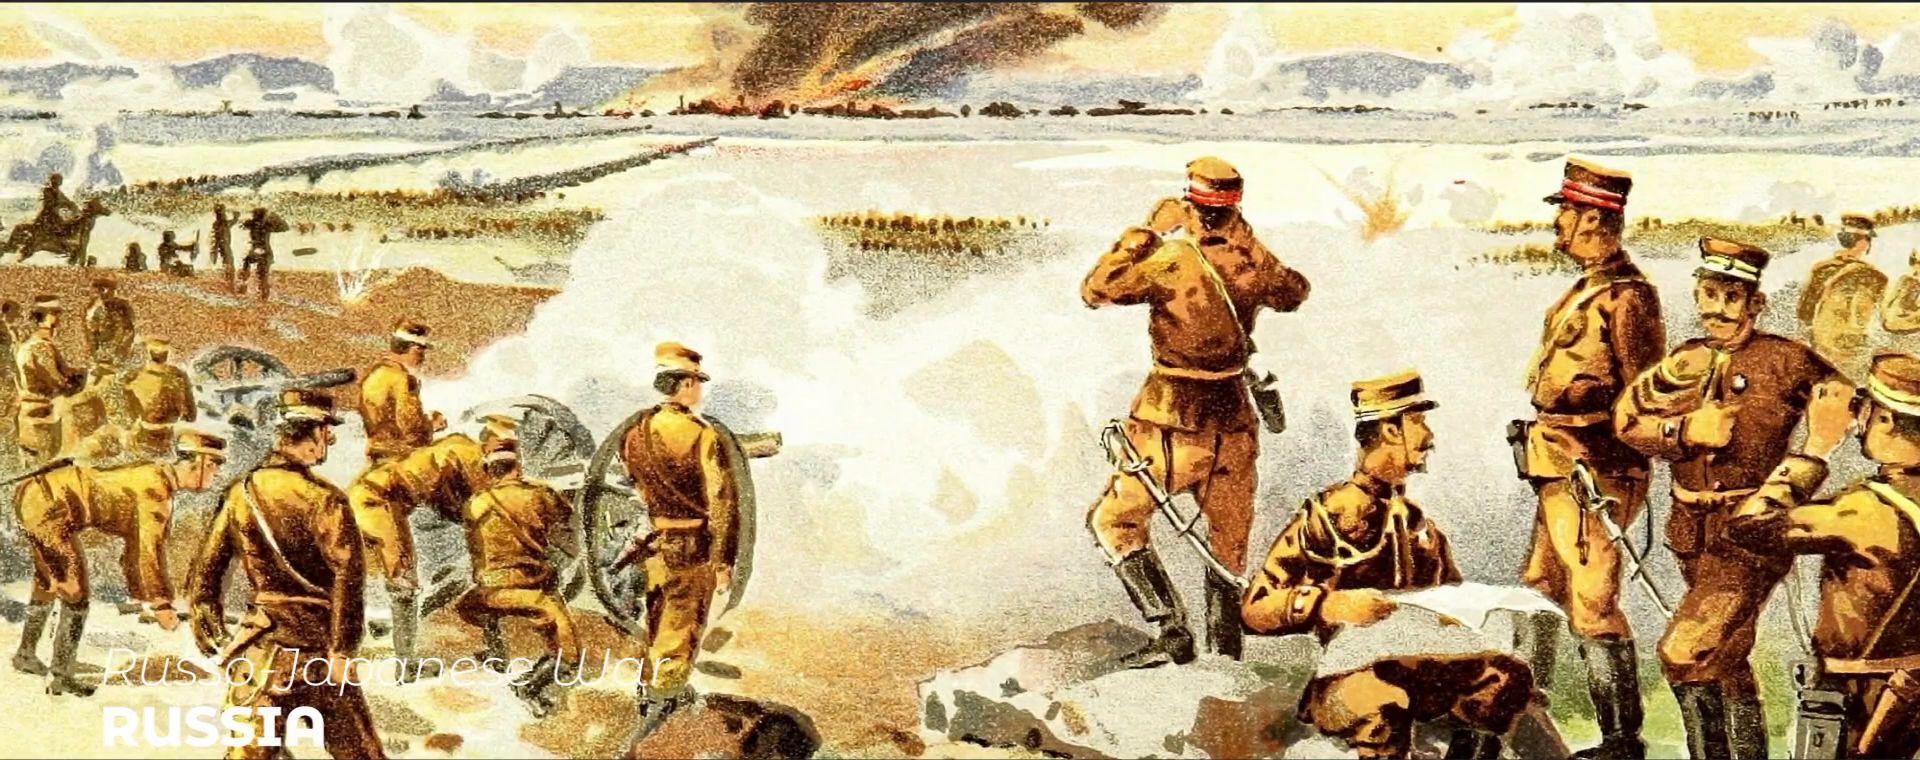 RUSSOJAPANESE WAR